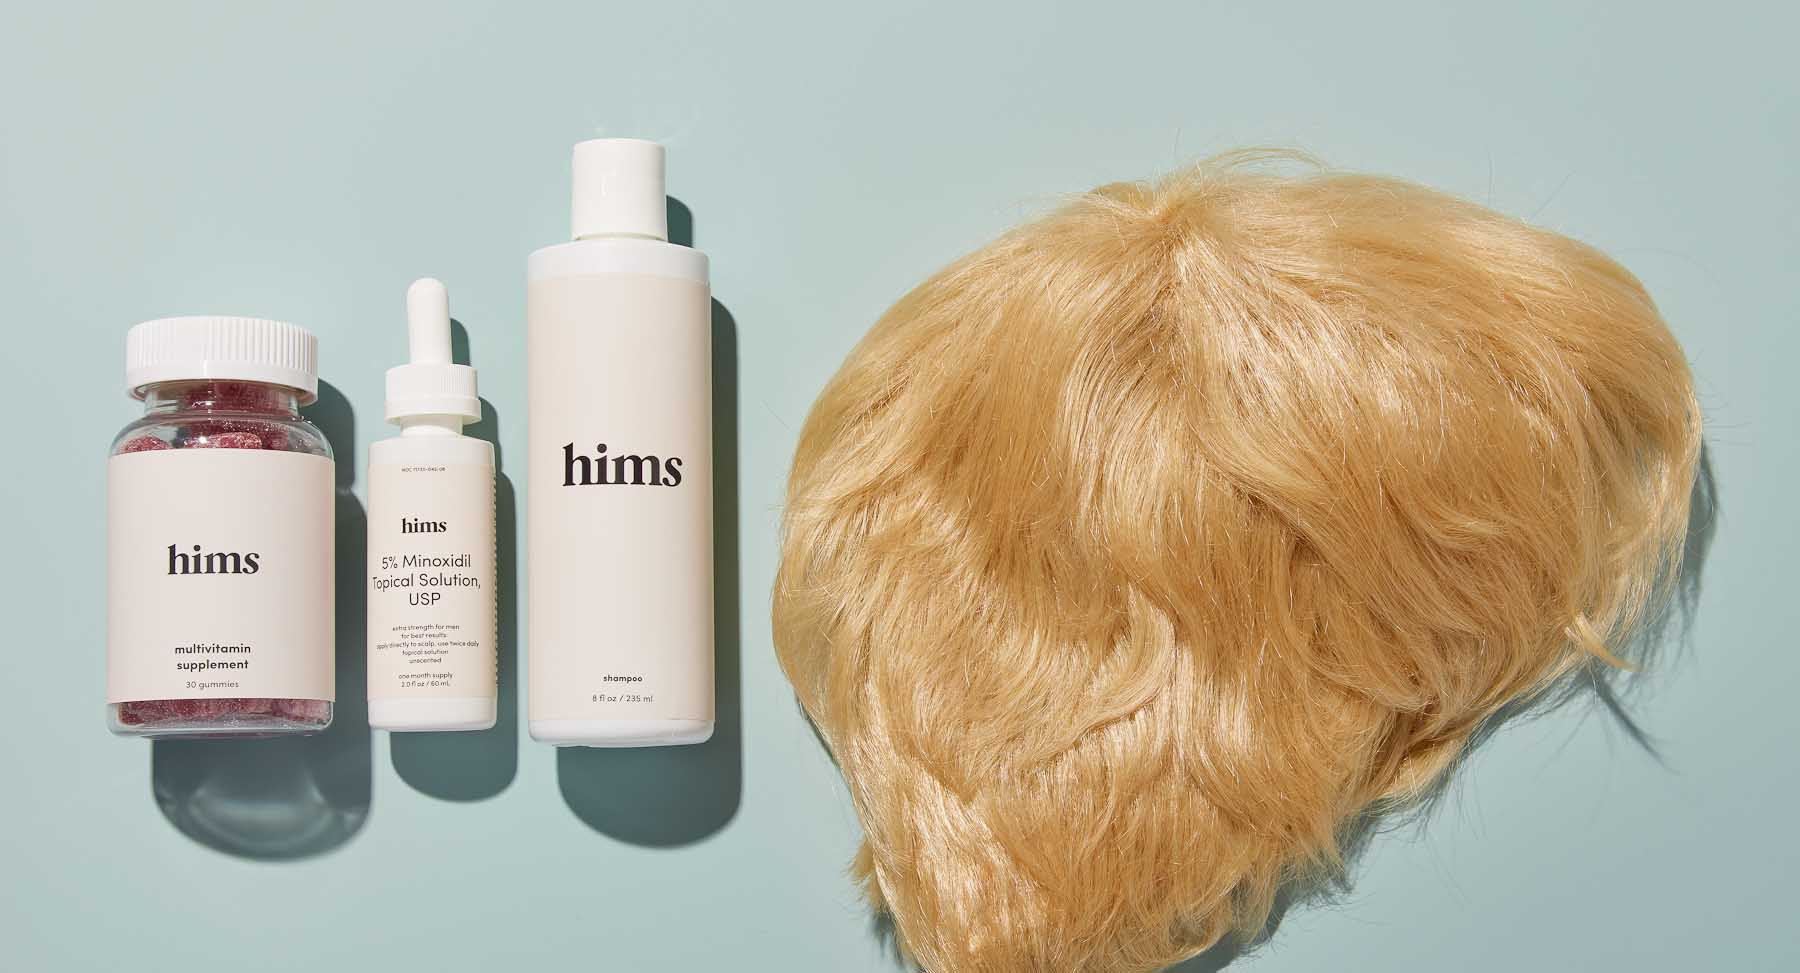 Hims Partners with Austin's Birds Barbershop